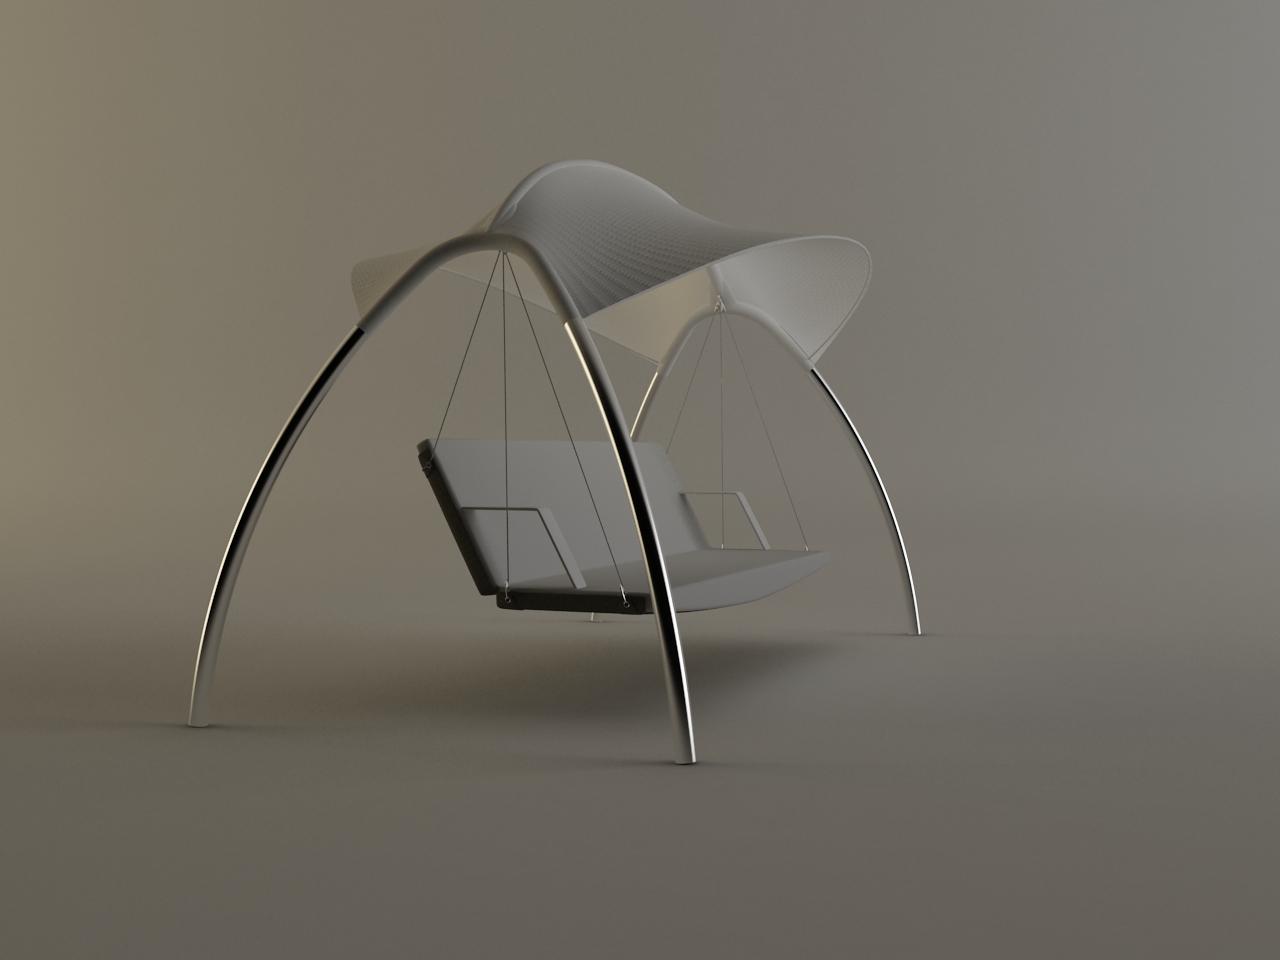 Garden igendesign product design and innovation for Design and innovation consultancy